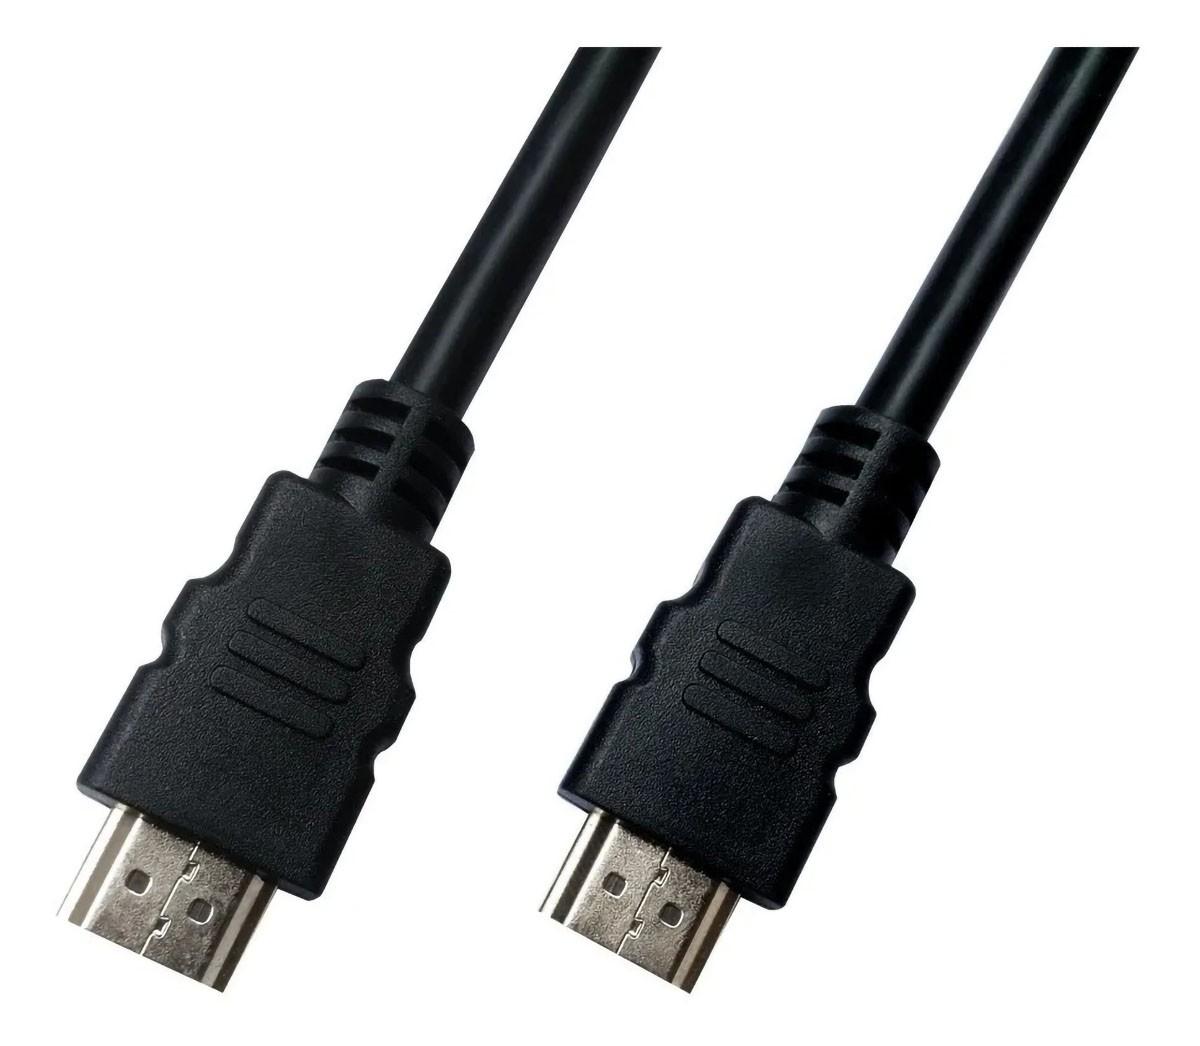 Cabo HDMI 1,8 Metros Proeletronic CAHD-2018